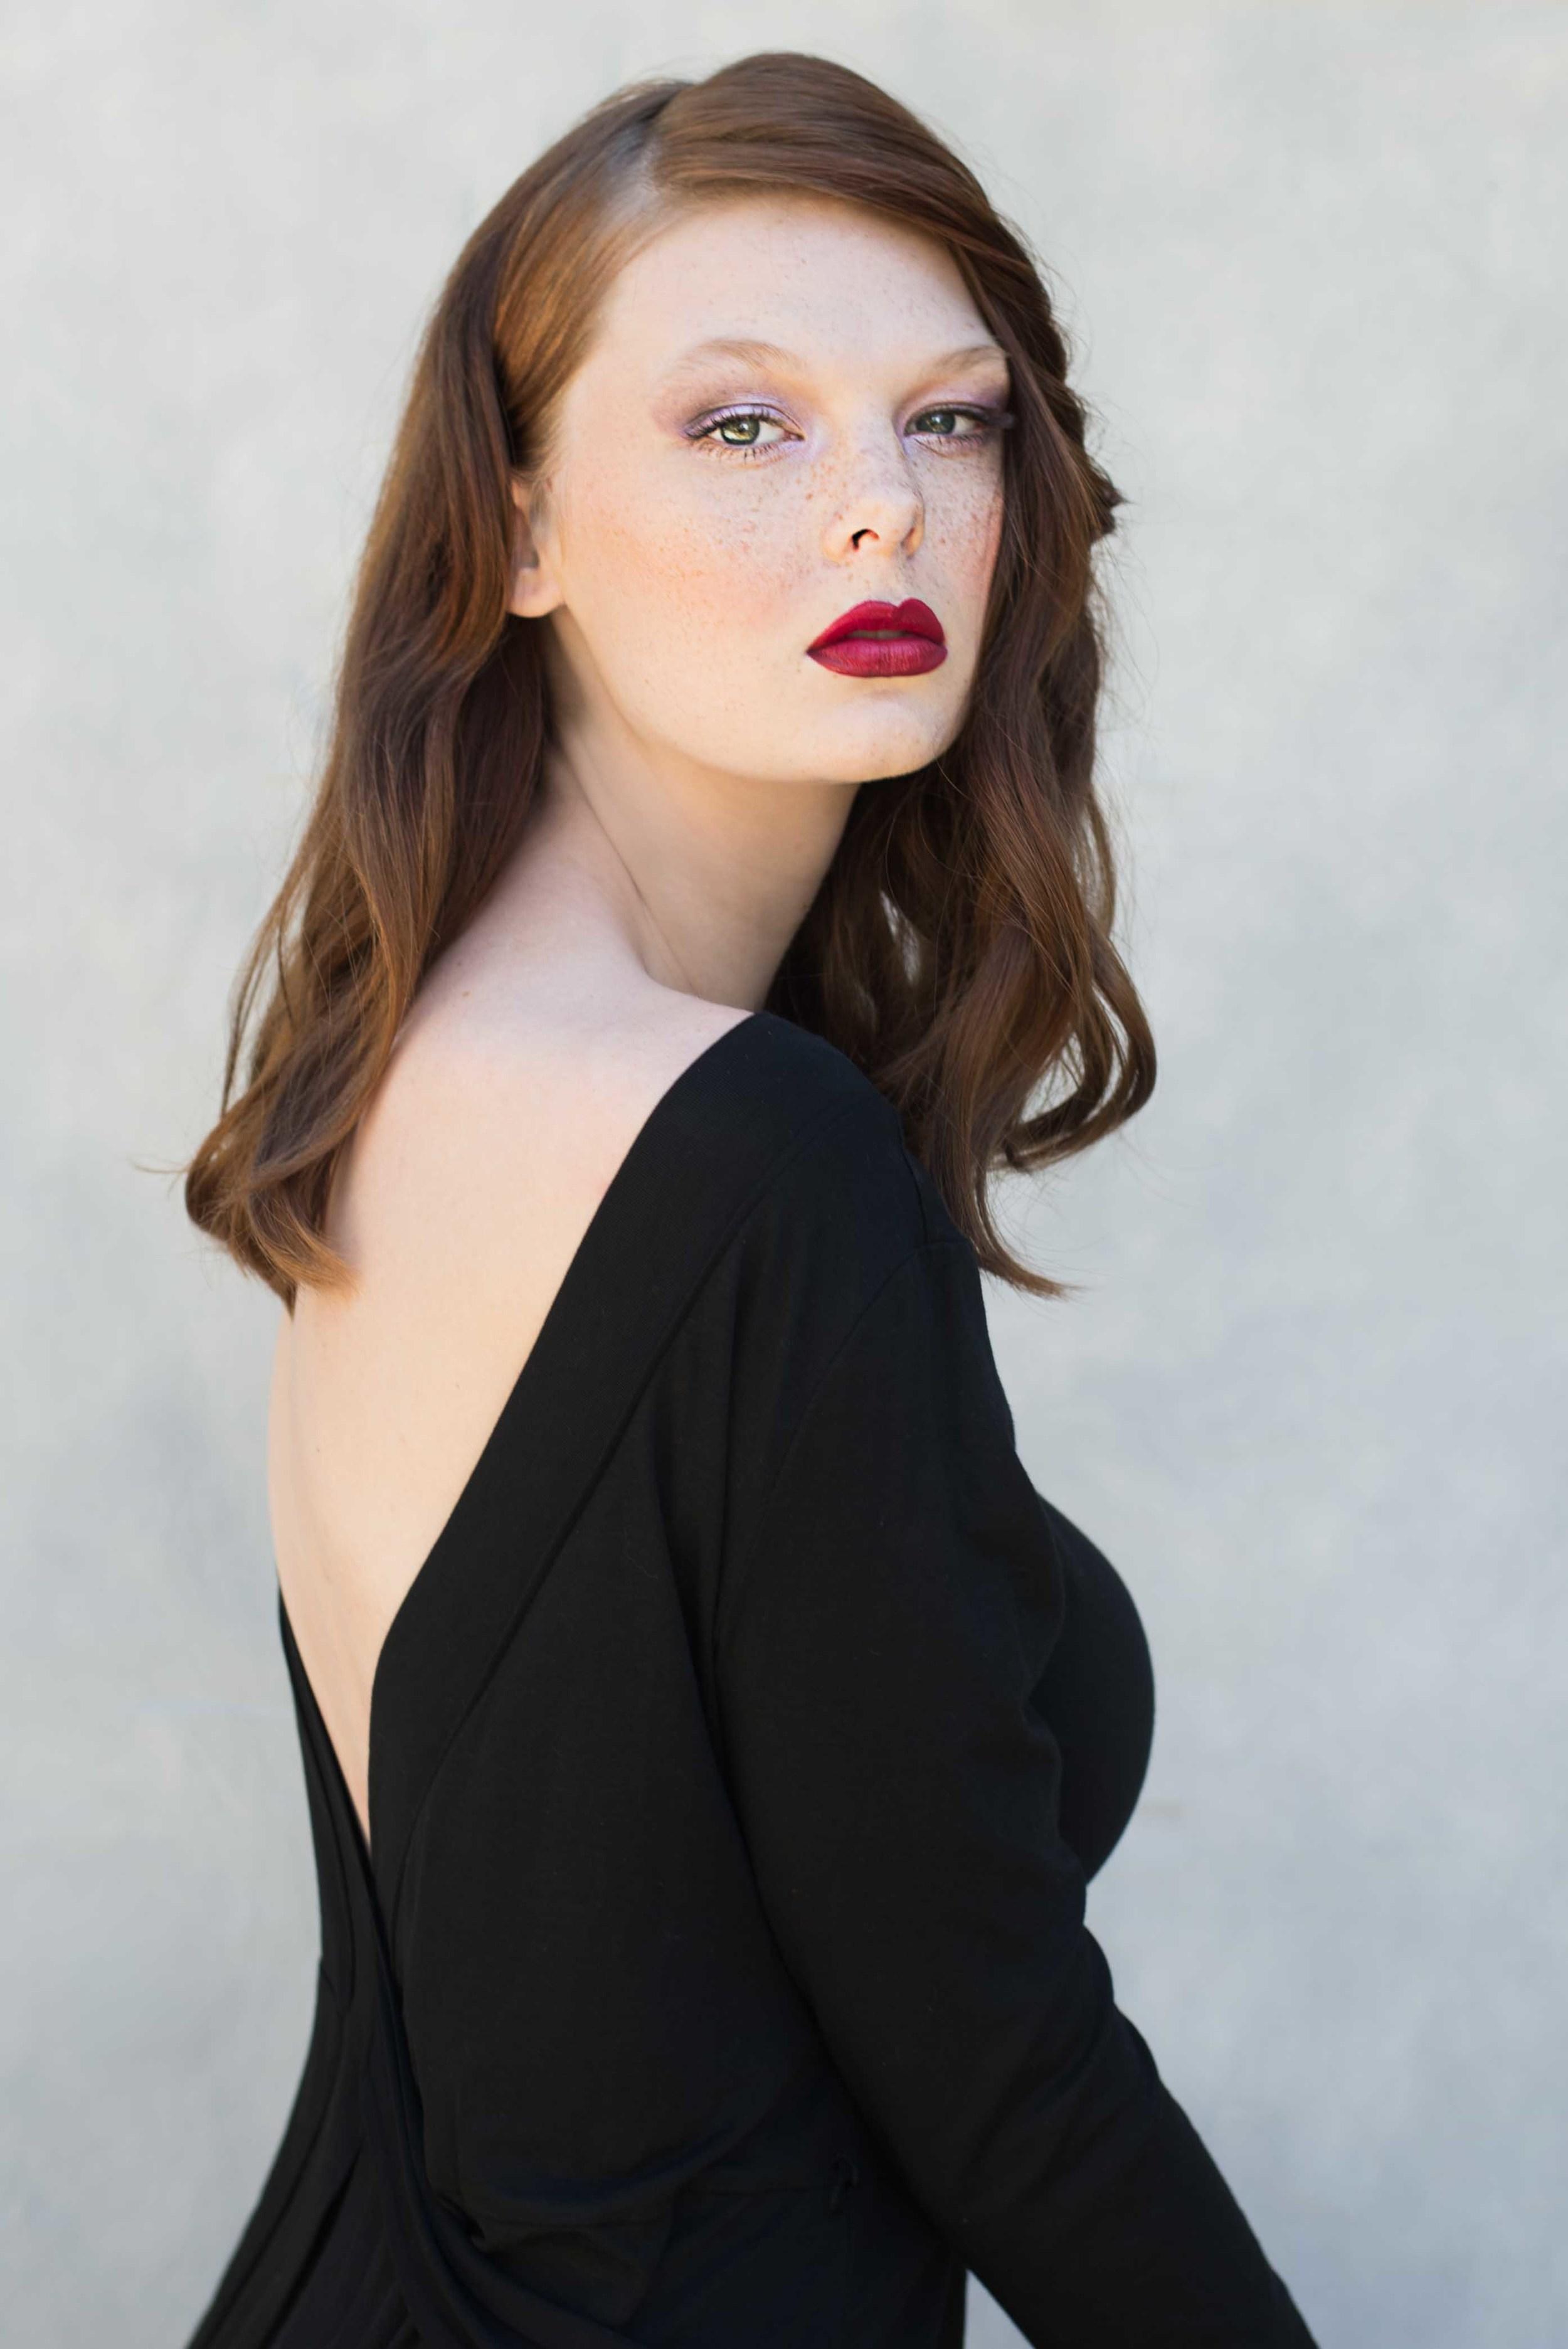 LA Fashion Editorial Commercial Photographer Alecia Lindsay